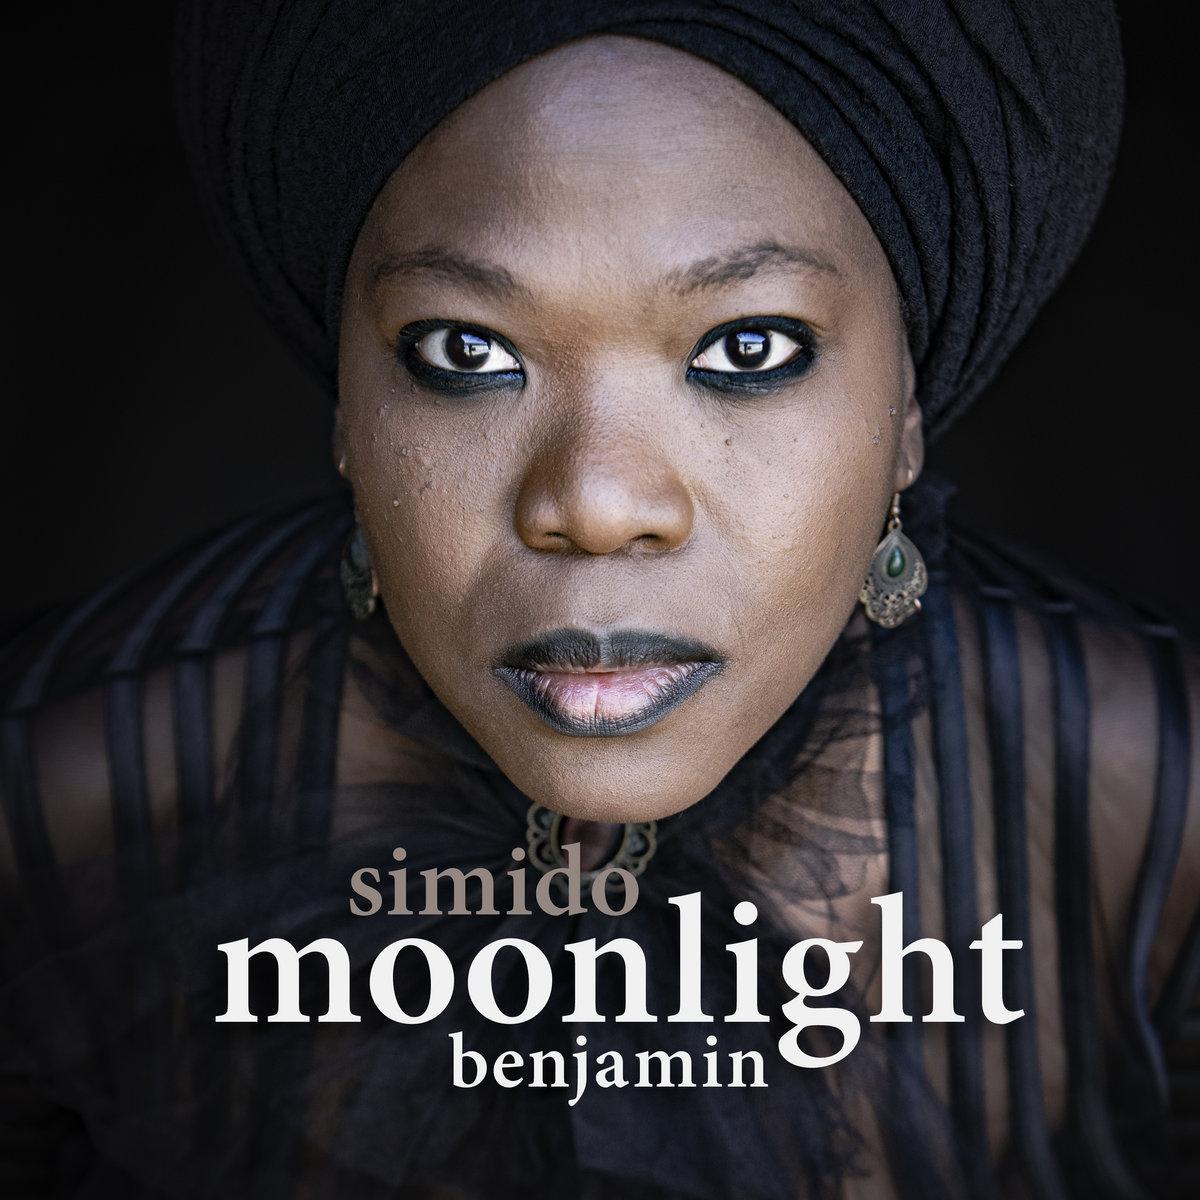 "Moonlight Benjamin ""Simido"" (31 janvier 2020, Ma Case/Absilone). - MUZZART"